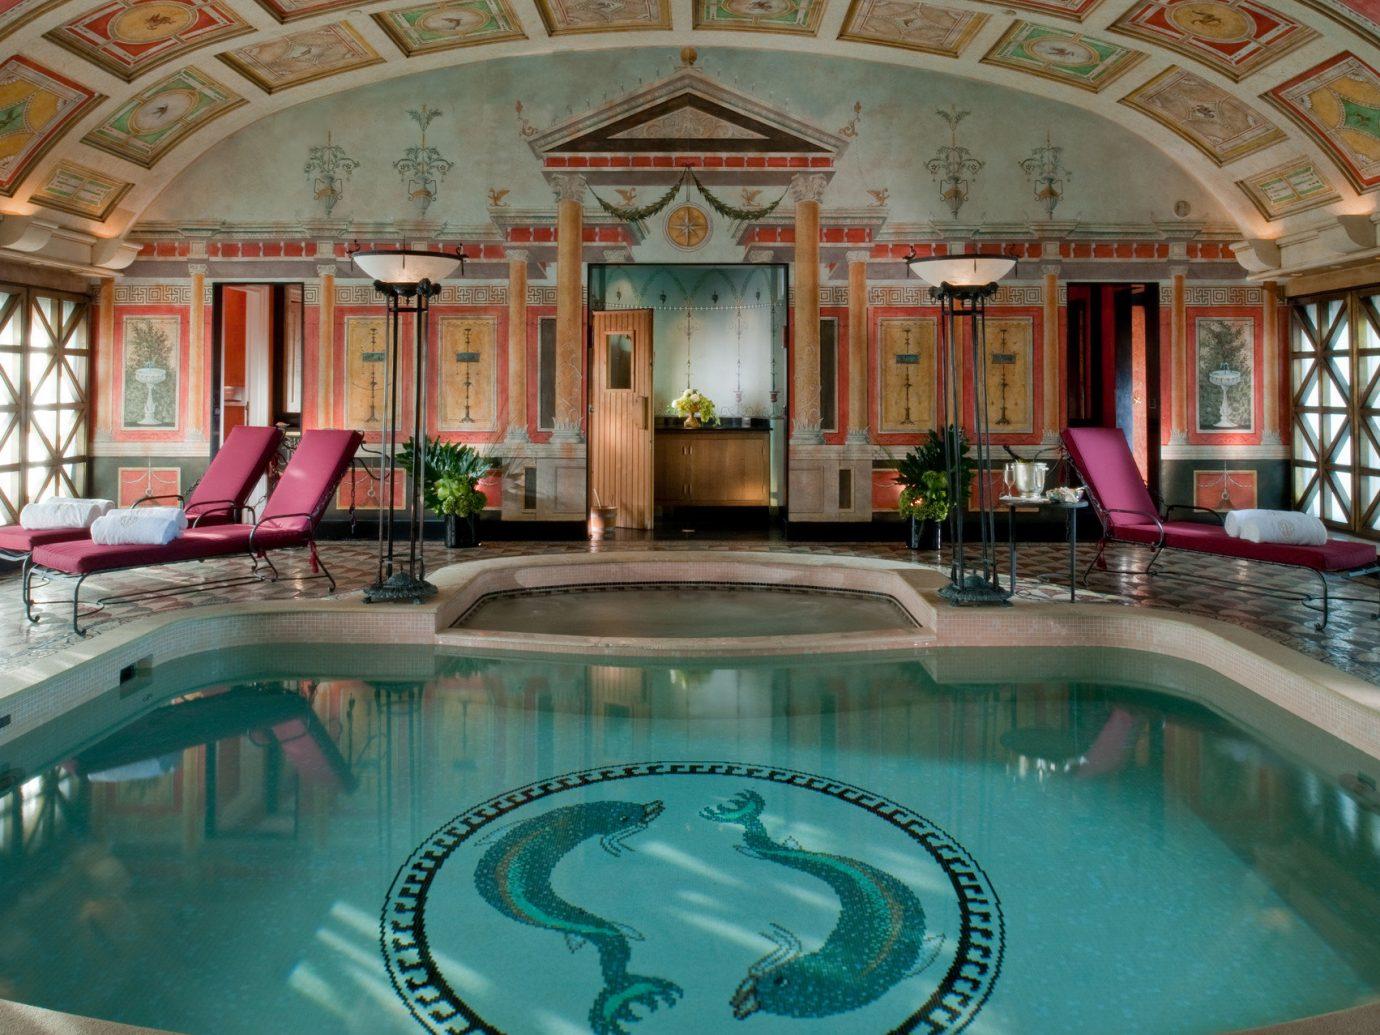 Trip Ideas indoor swimming pool property estate building mansion Resort palace Villa real estate several